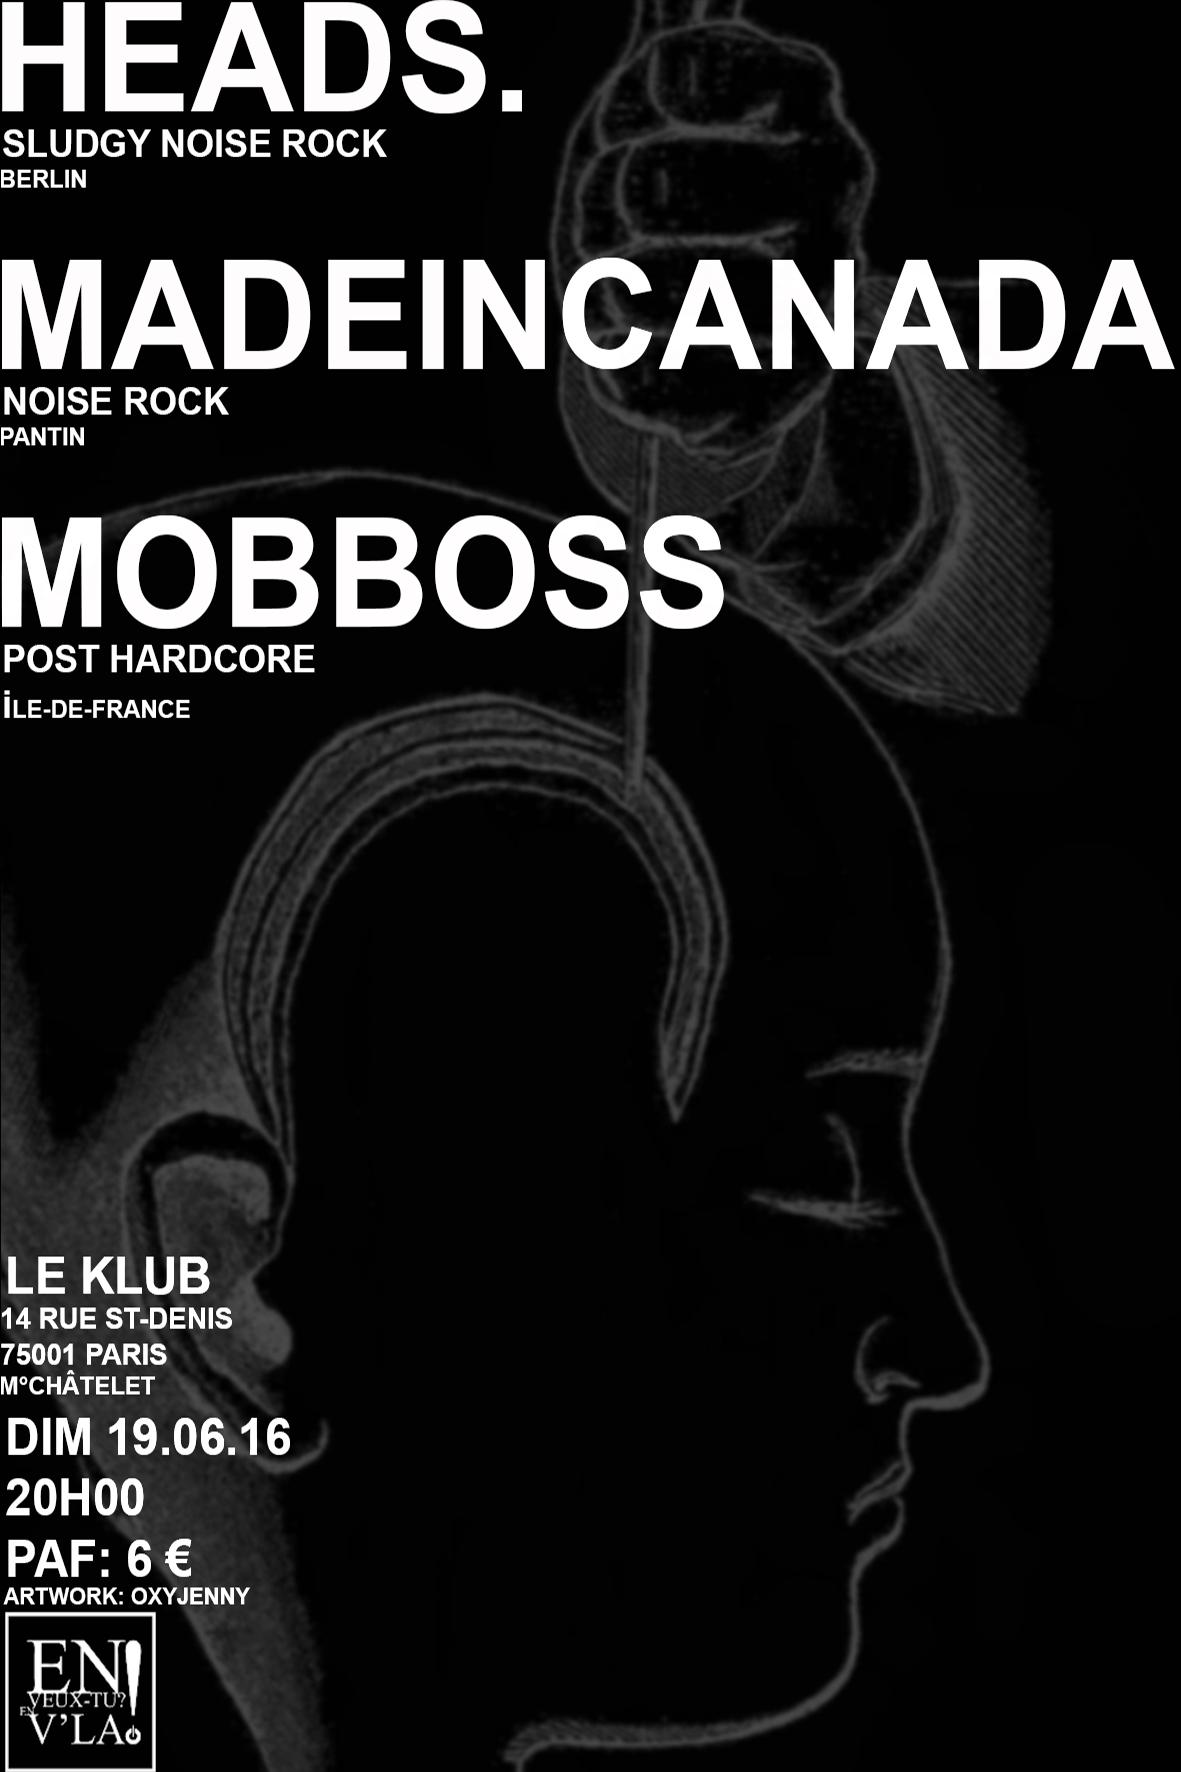 HEADS. + MADEINCANADA + MOBBOSS